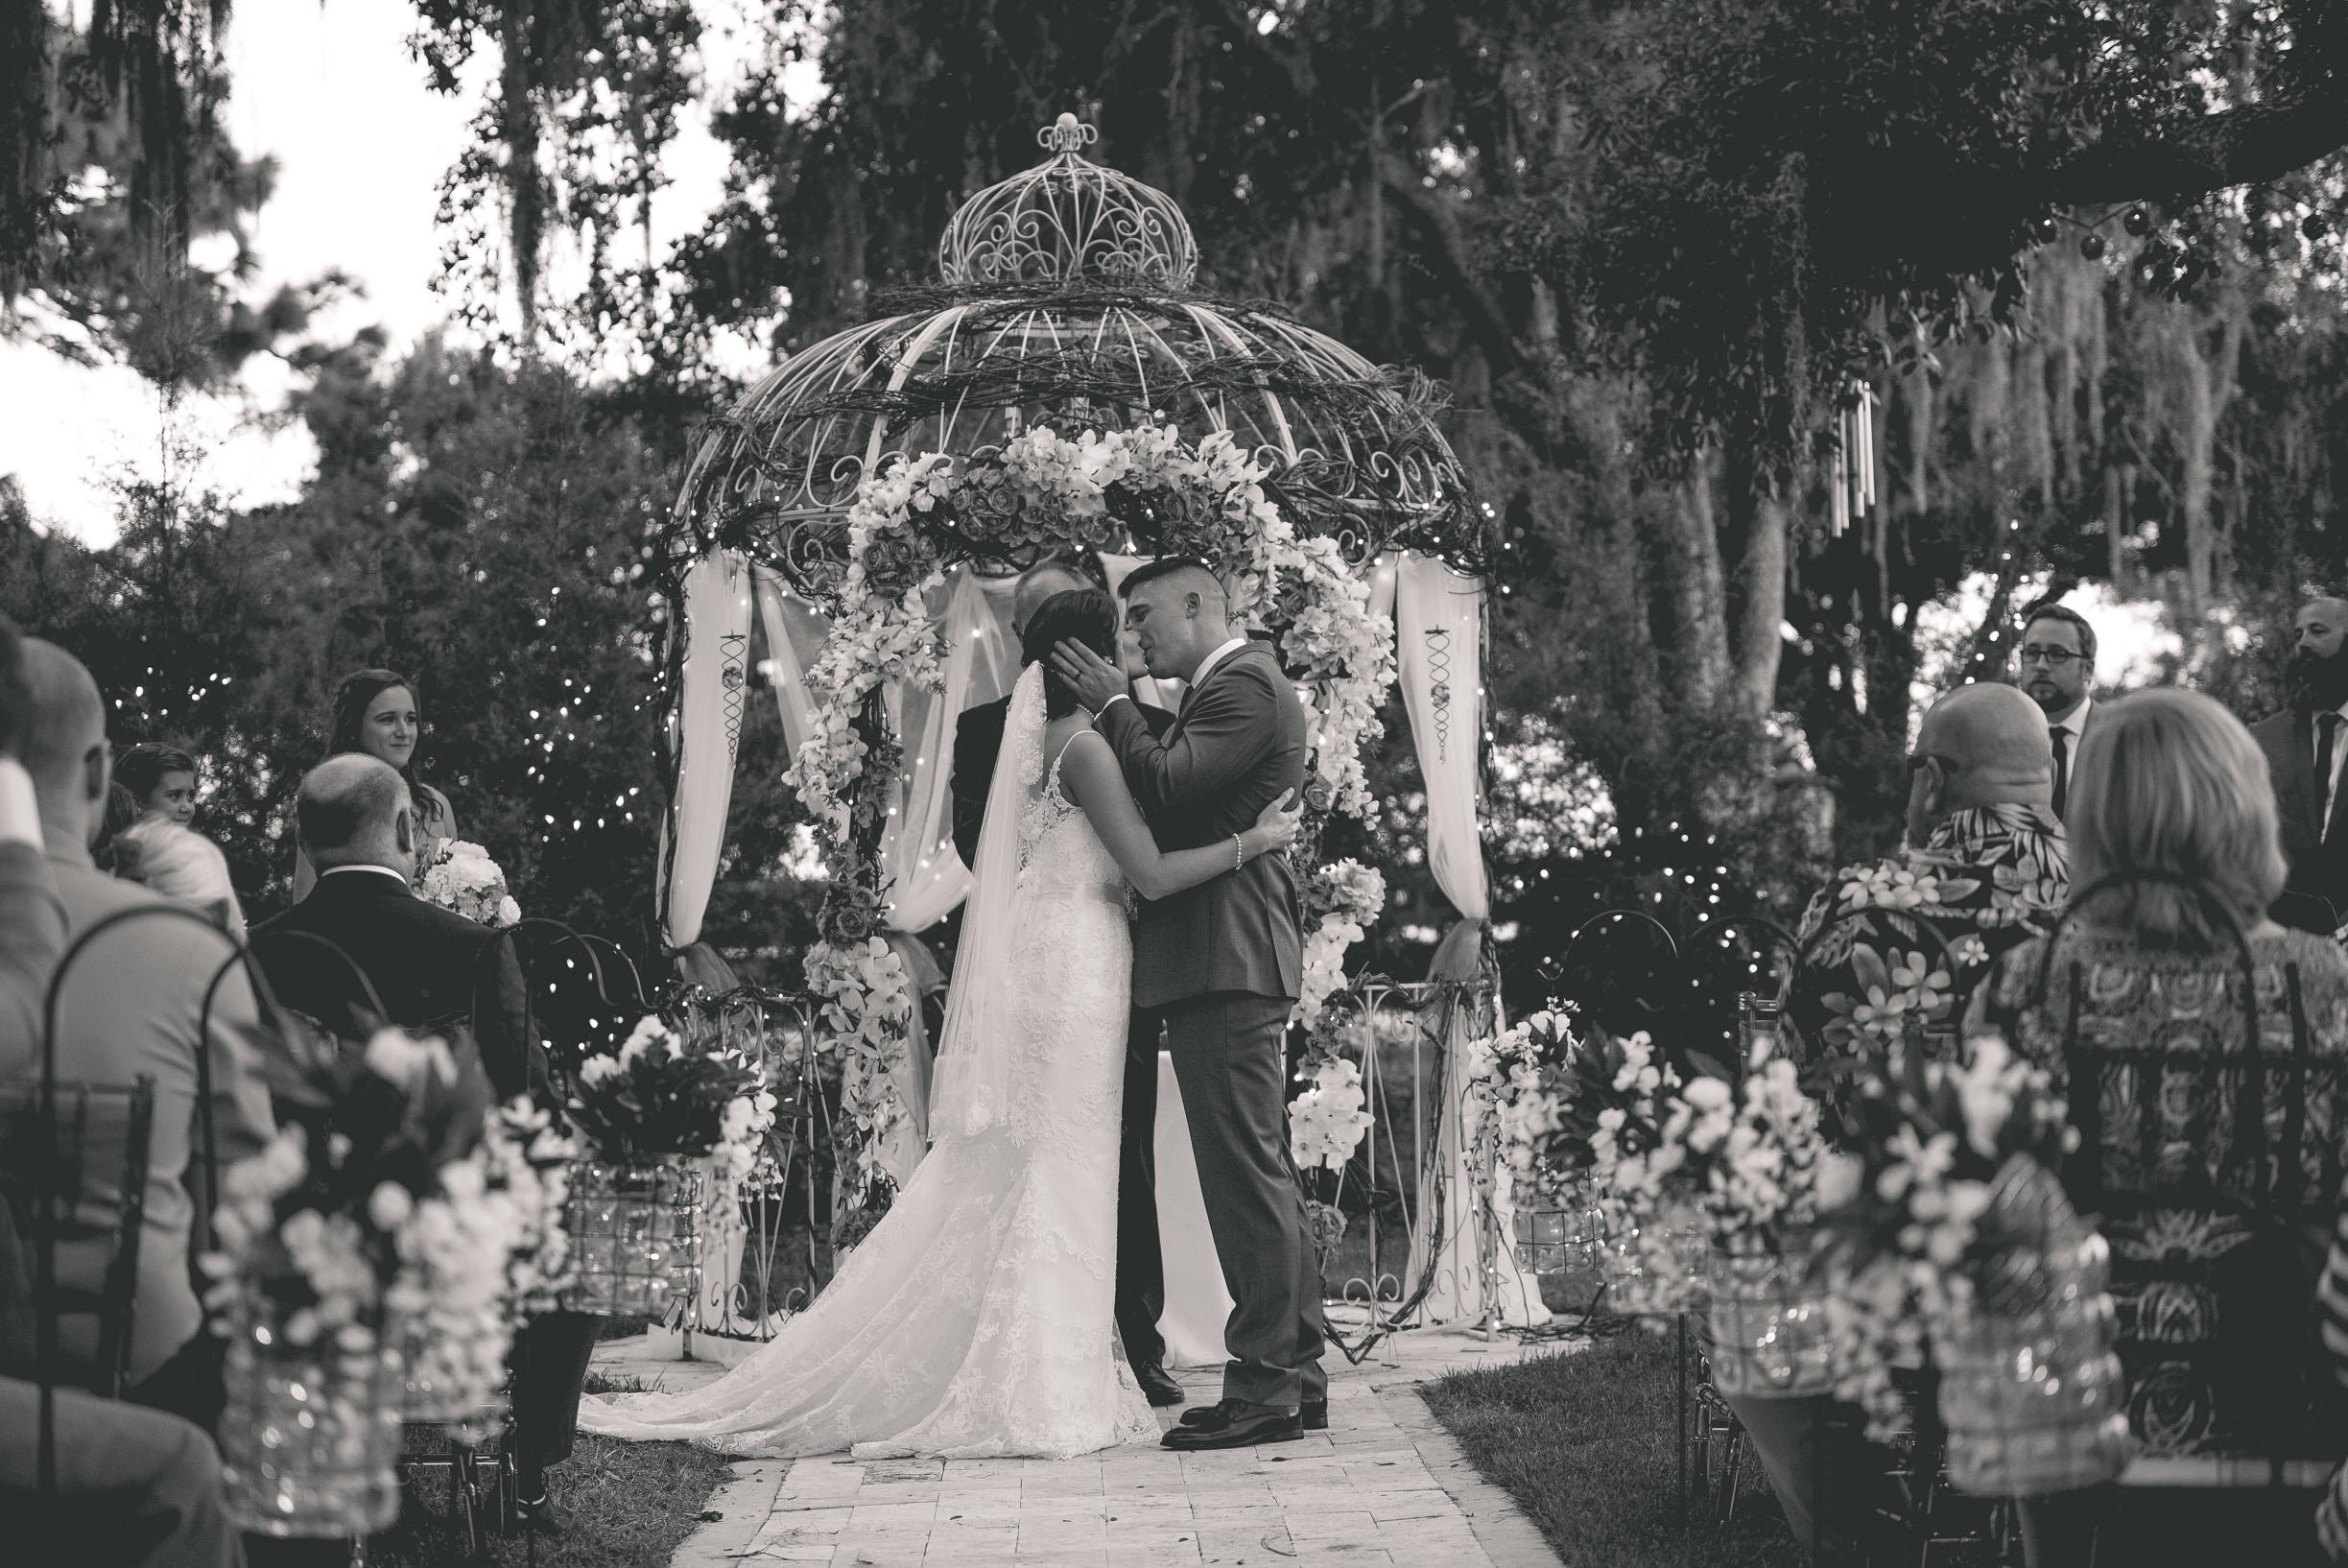 046Portland Wedding Photographer timothy capp.jpg